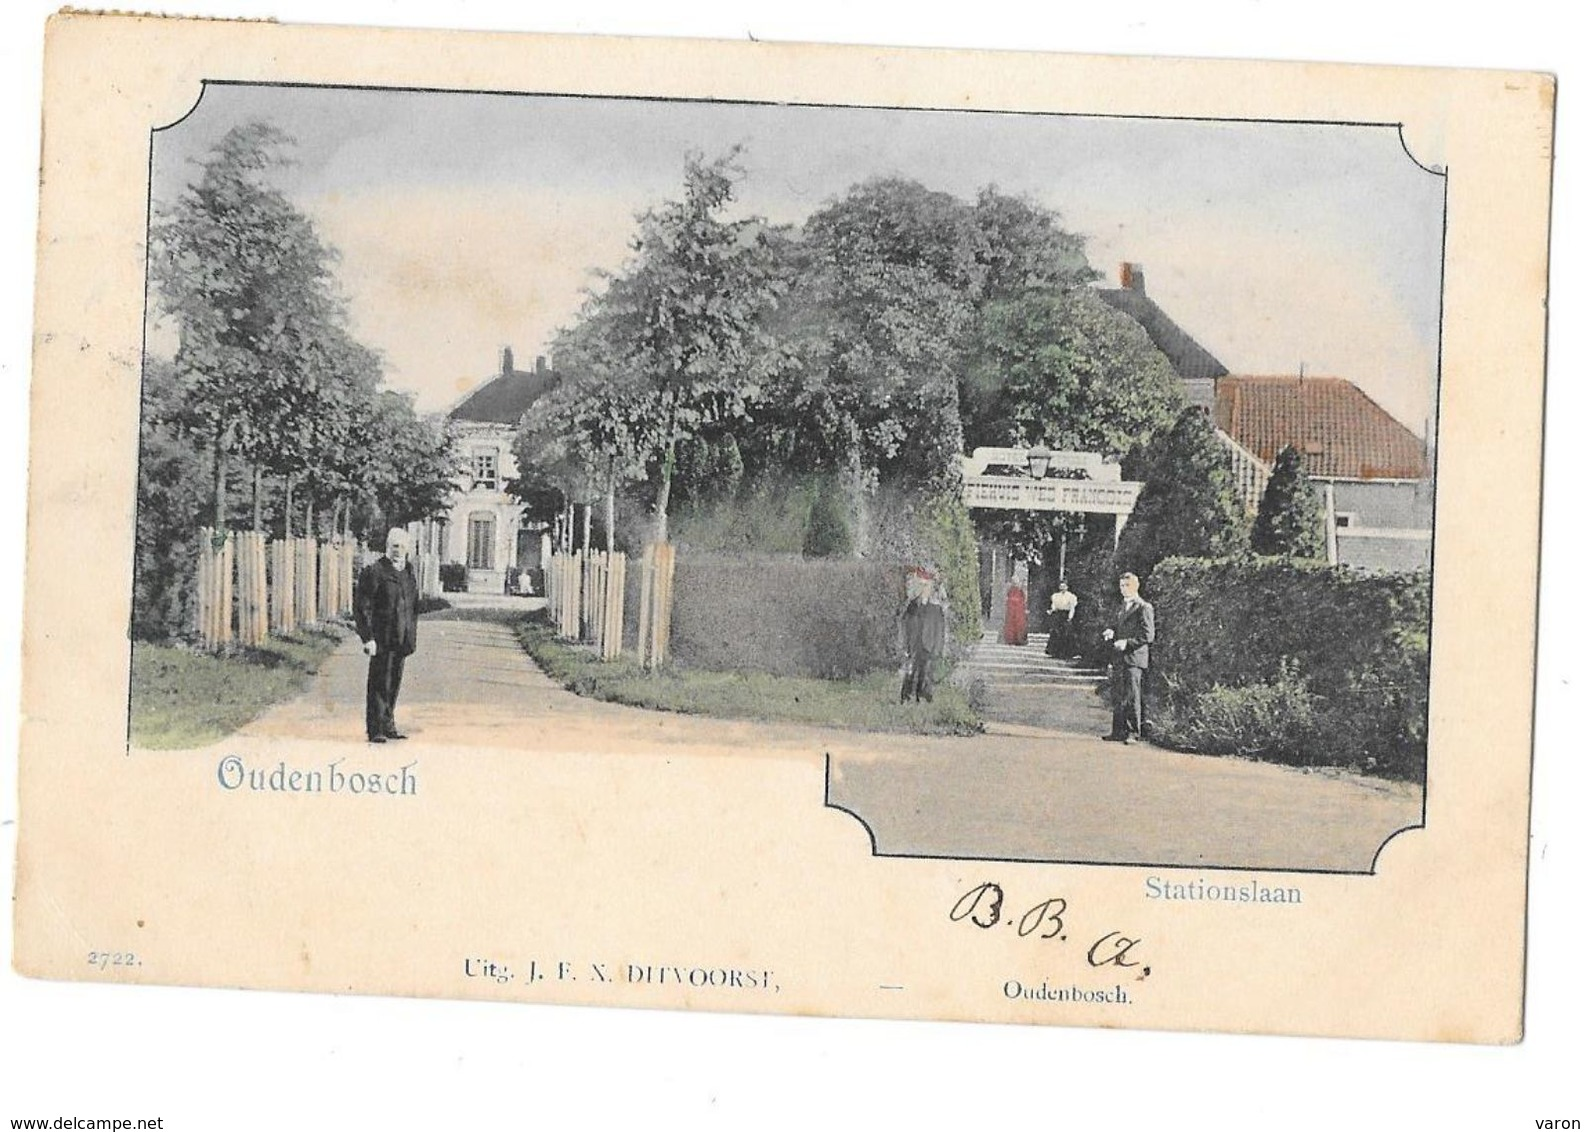 Pays-Bas -  OUDENBOSCH -    STATIONSLAAN - HOTEL TIVOLI   - Carte Pionnière 1903 - Editeur J.F.X.DITVOORST - Autres